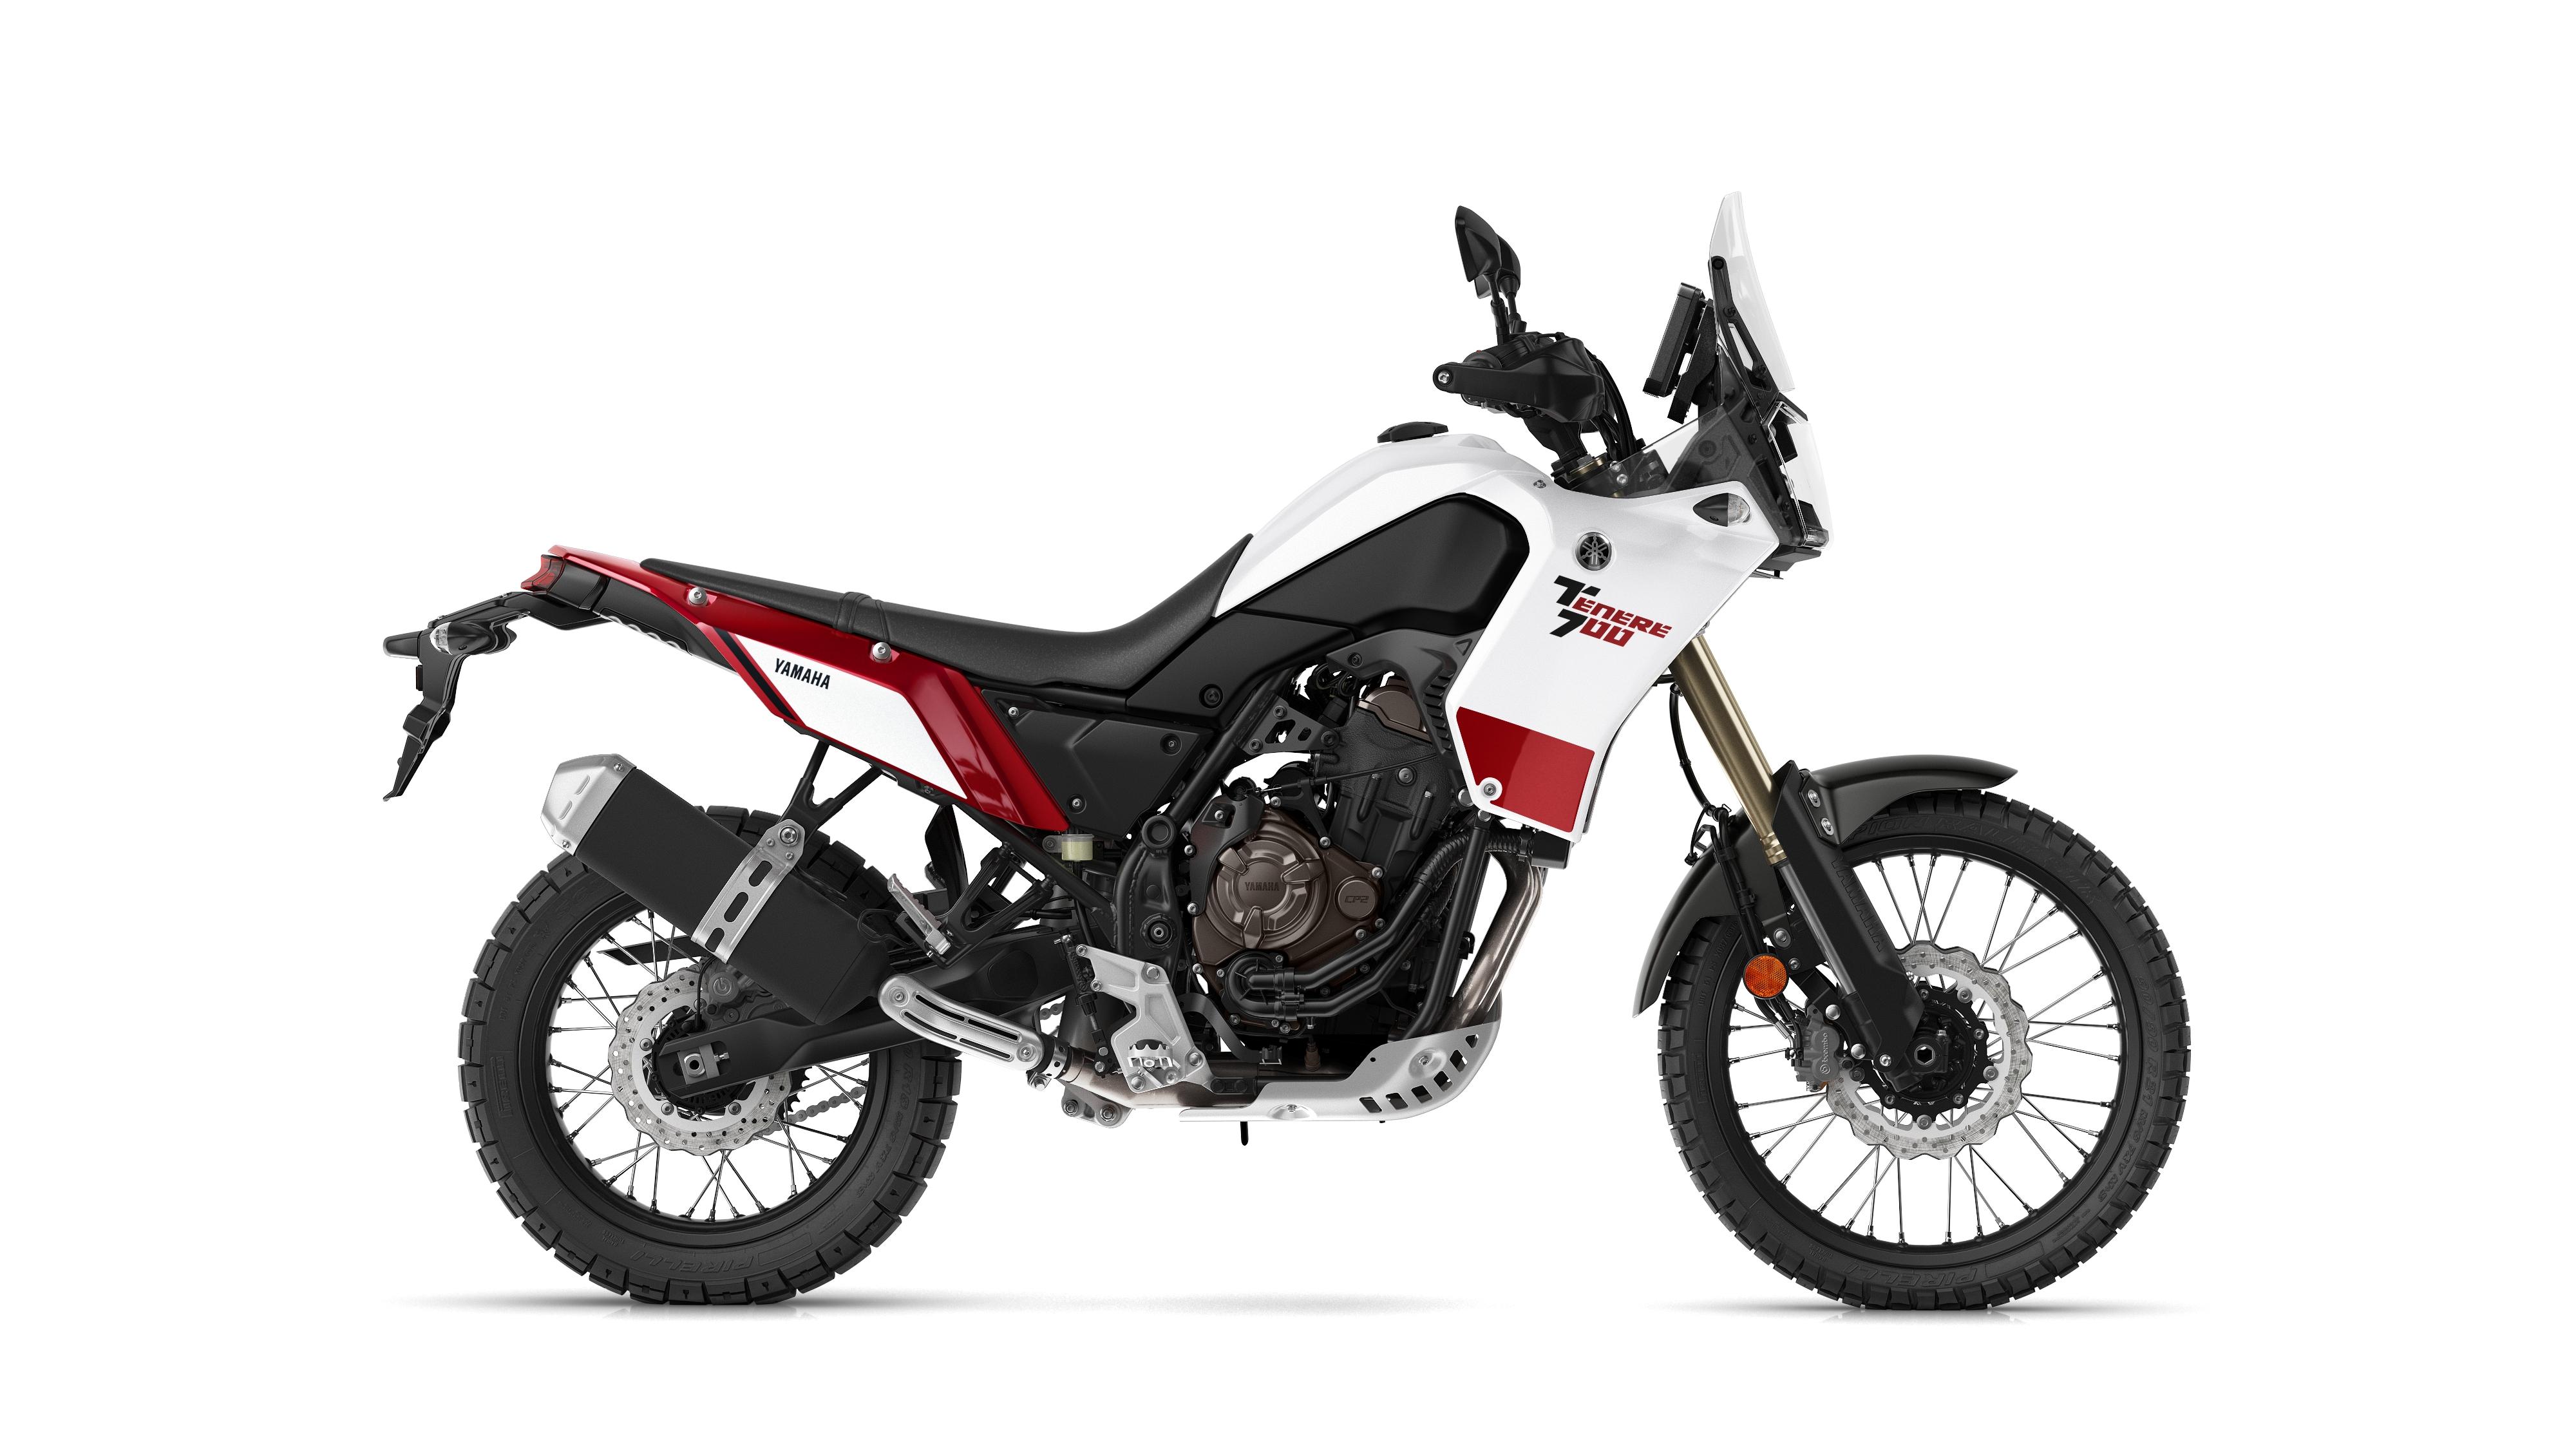 Yamaha Tenere 700 nu bestellen